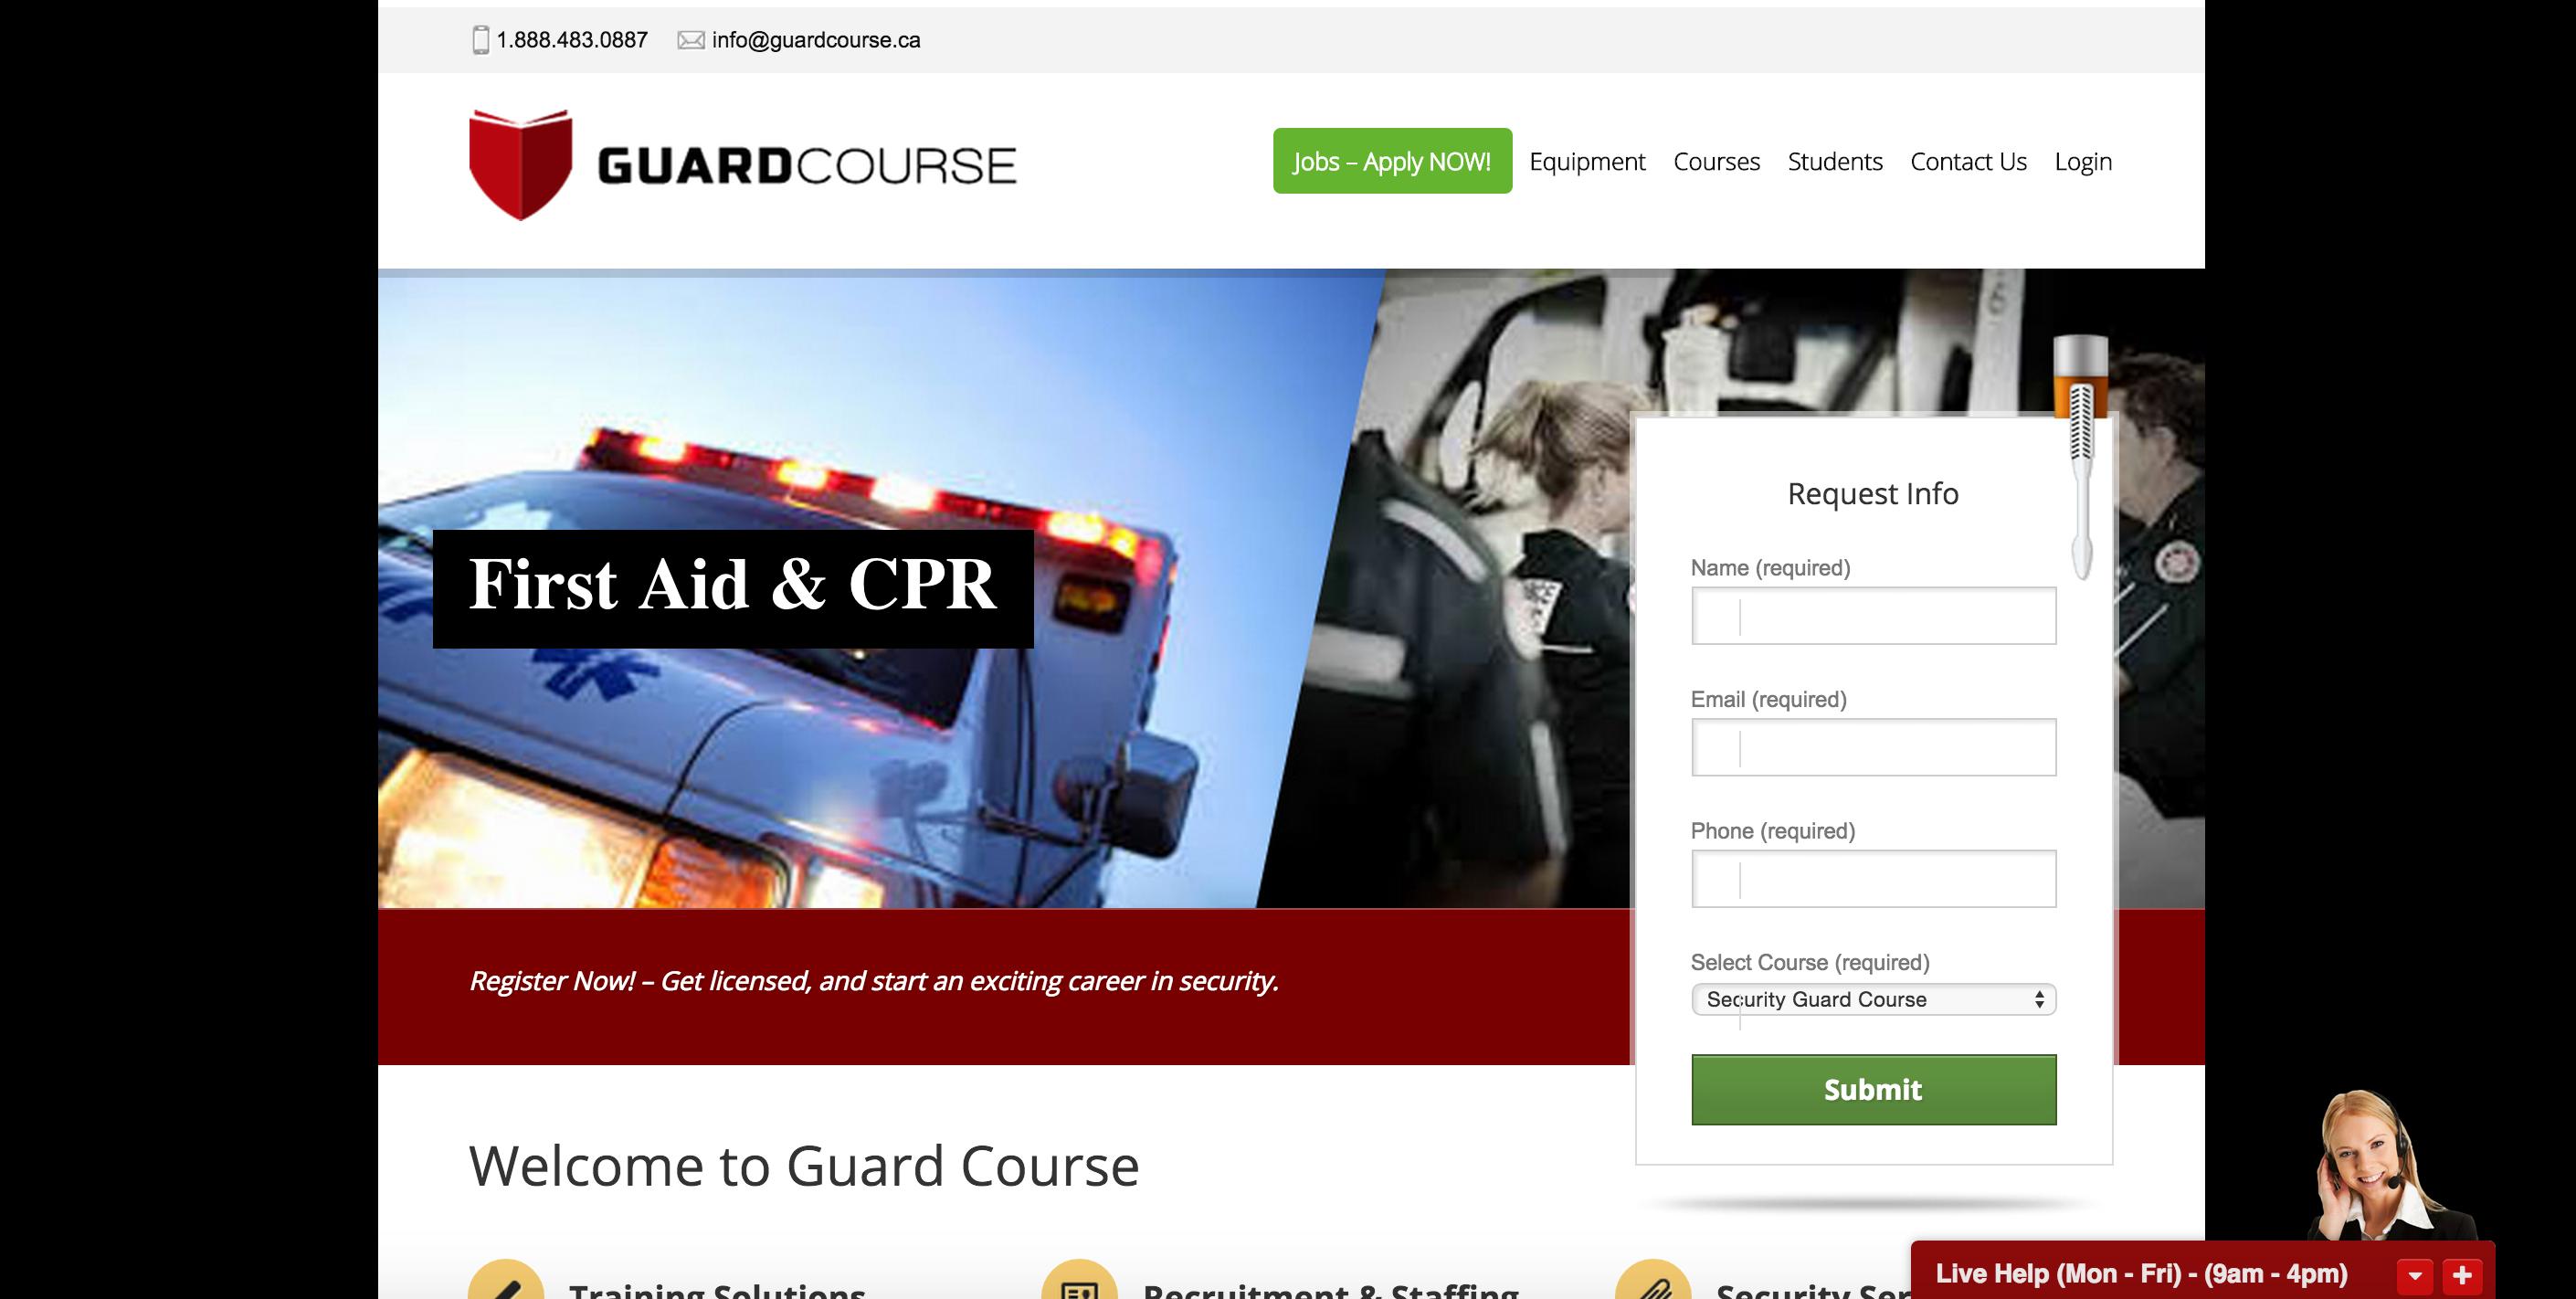 Guard Course